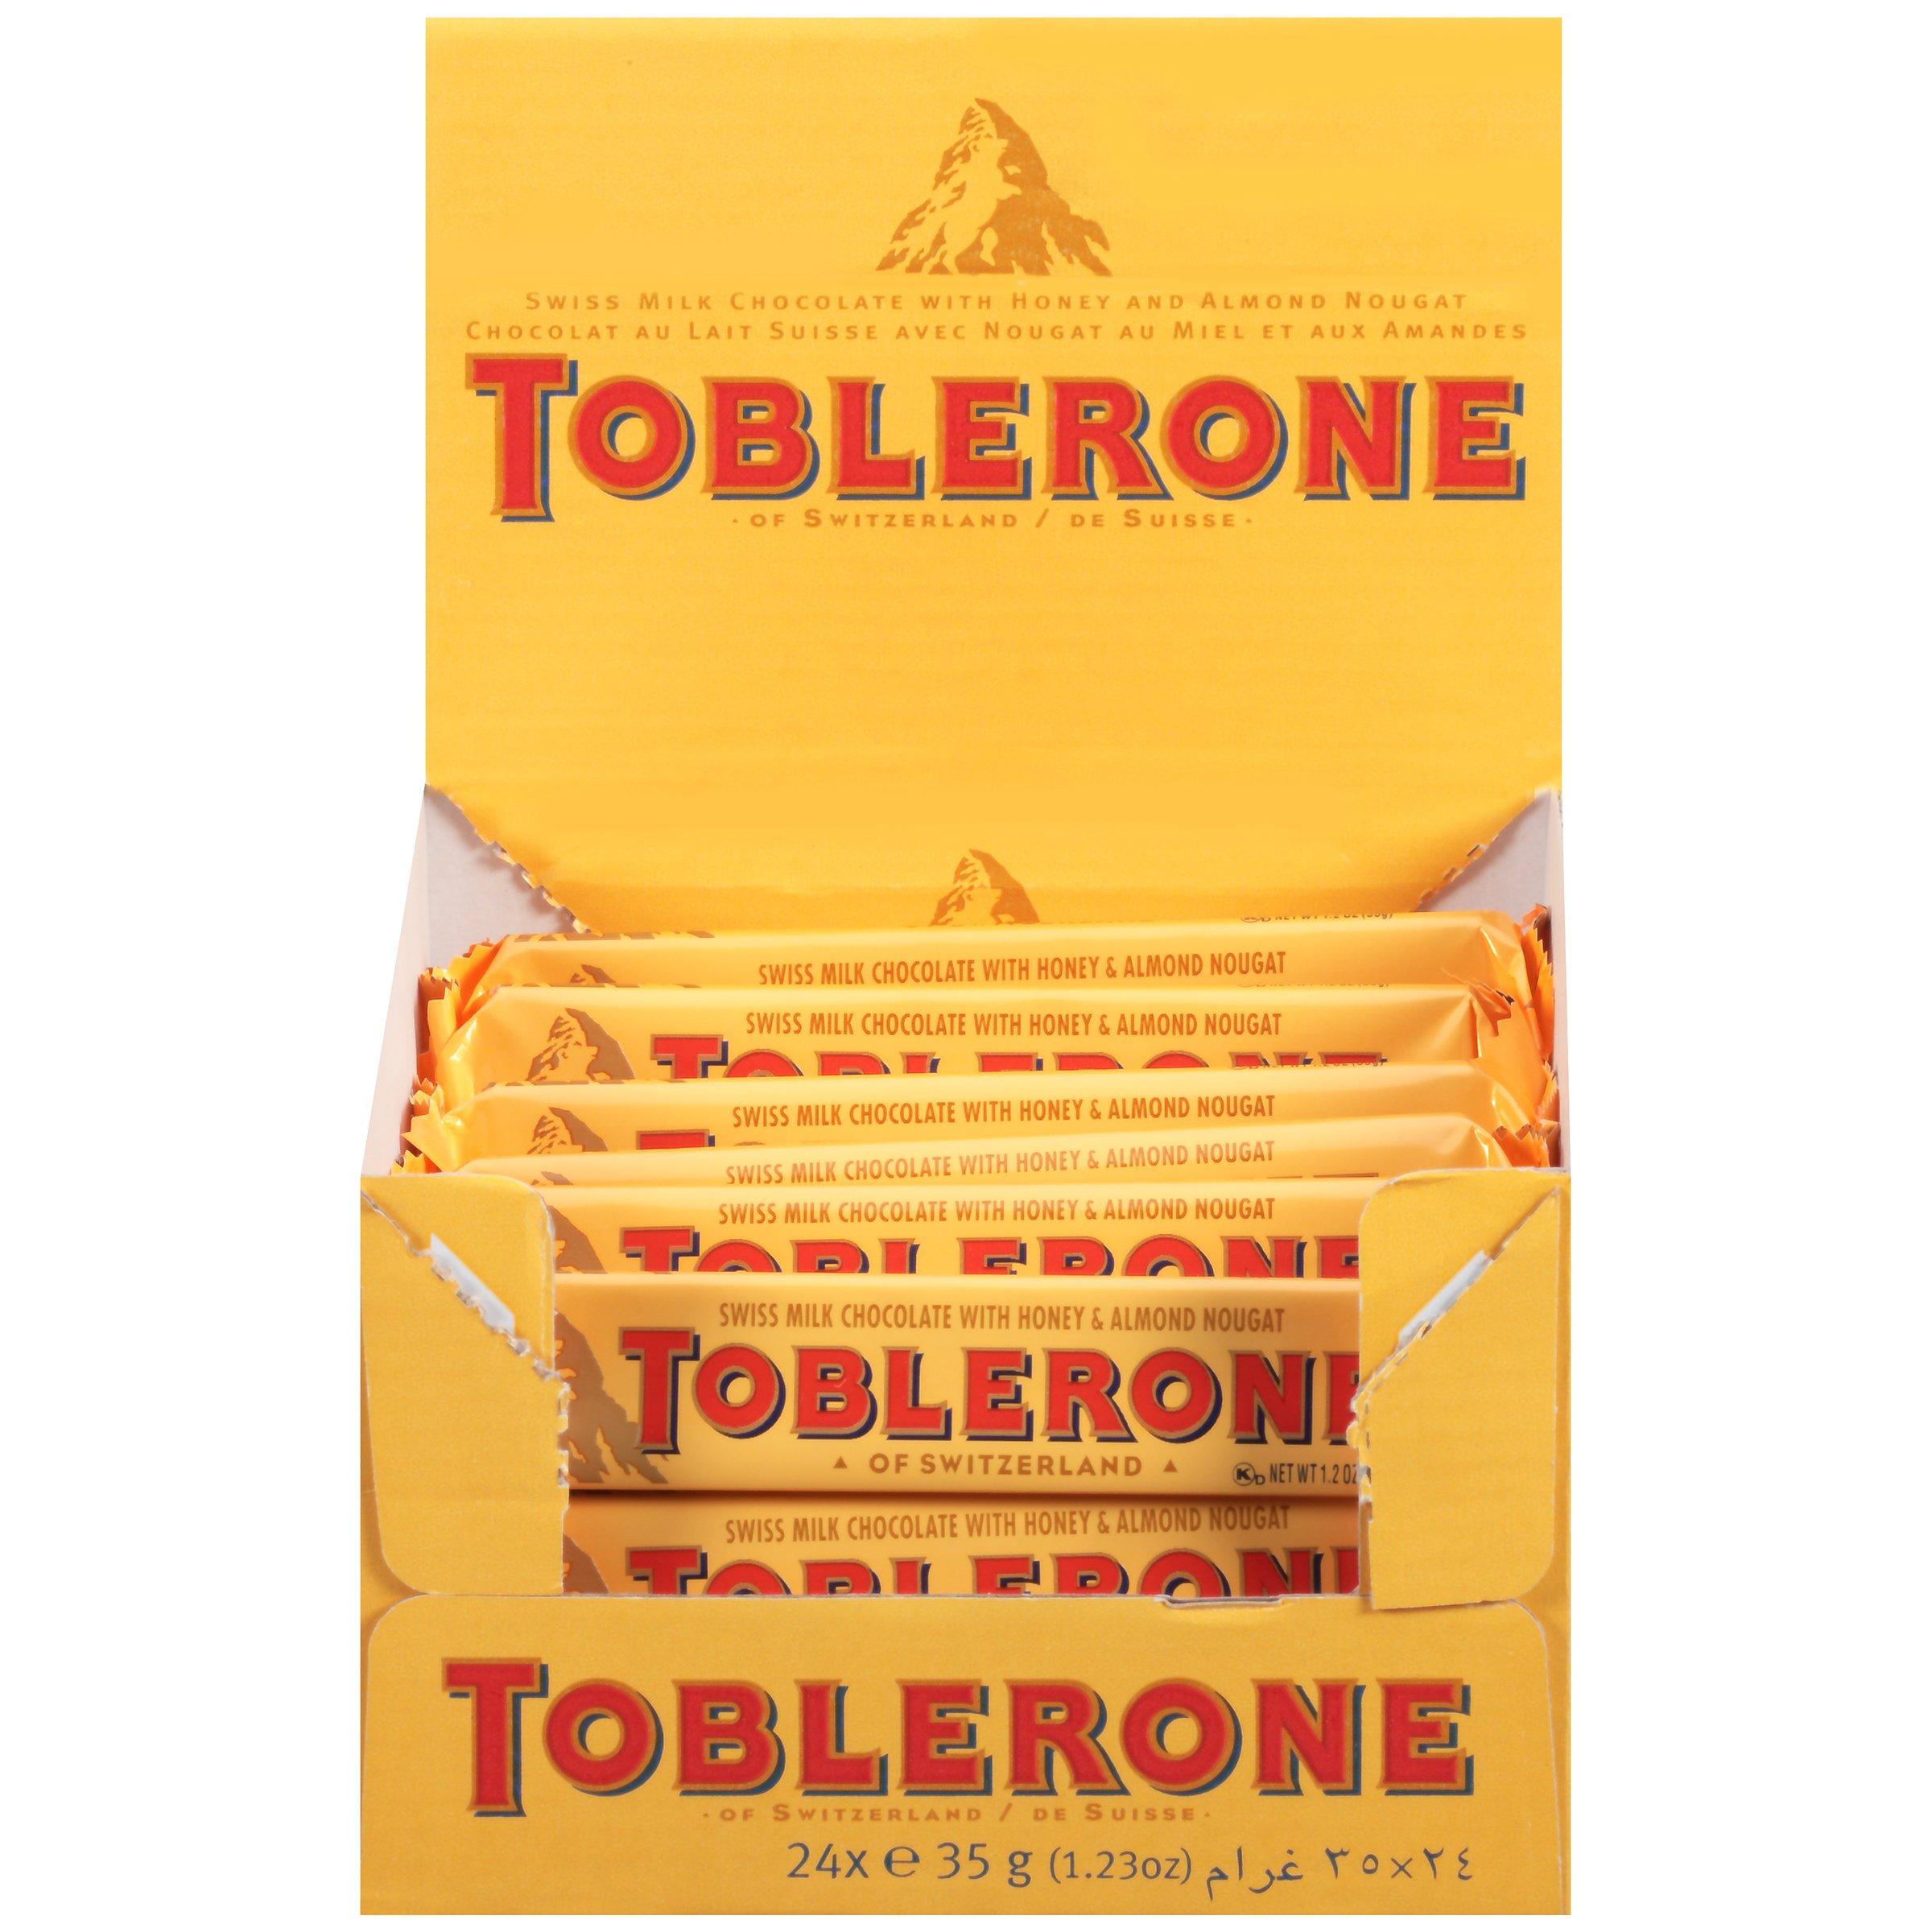 Toblerone Swiss Milk Chocolate with Honey & Almond Nougat, Easter Chocolate, 24 - 1.23 oz Bars